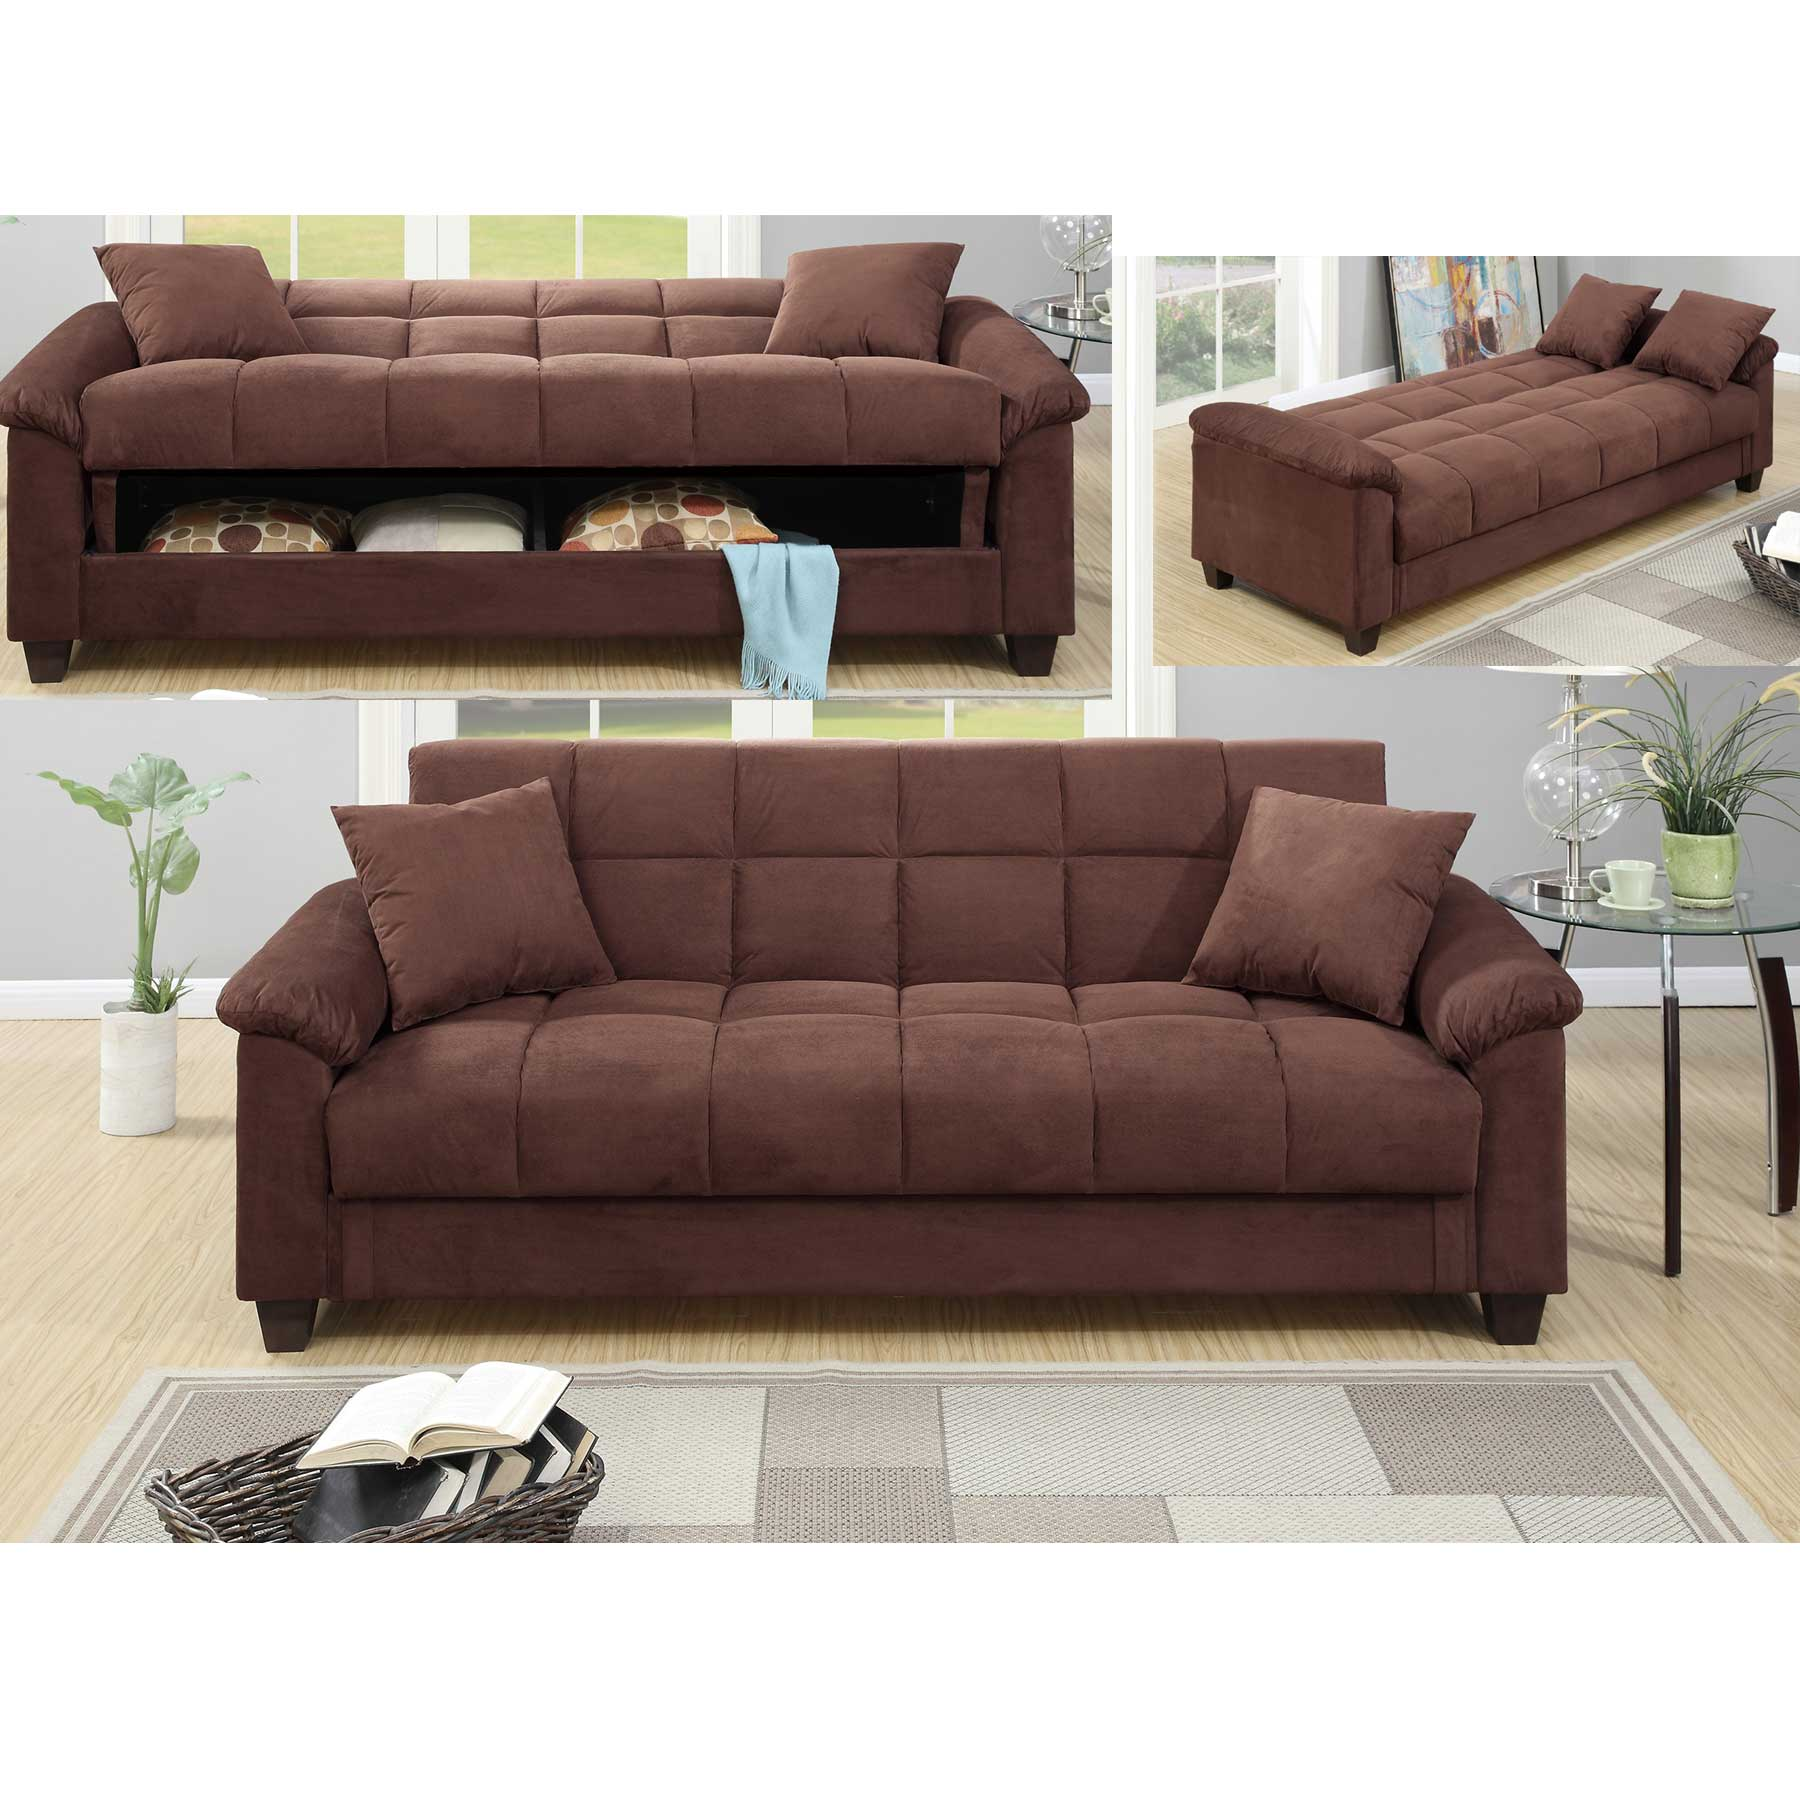 Chocolate Microfiber Storage Futon Sofa Bed Walmart